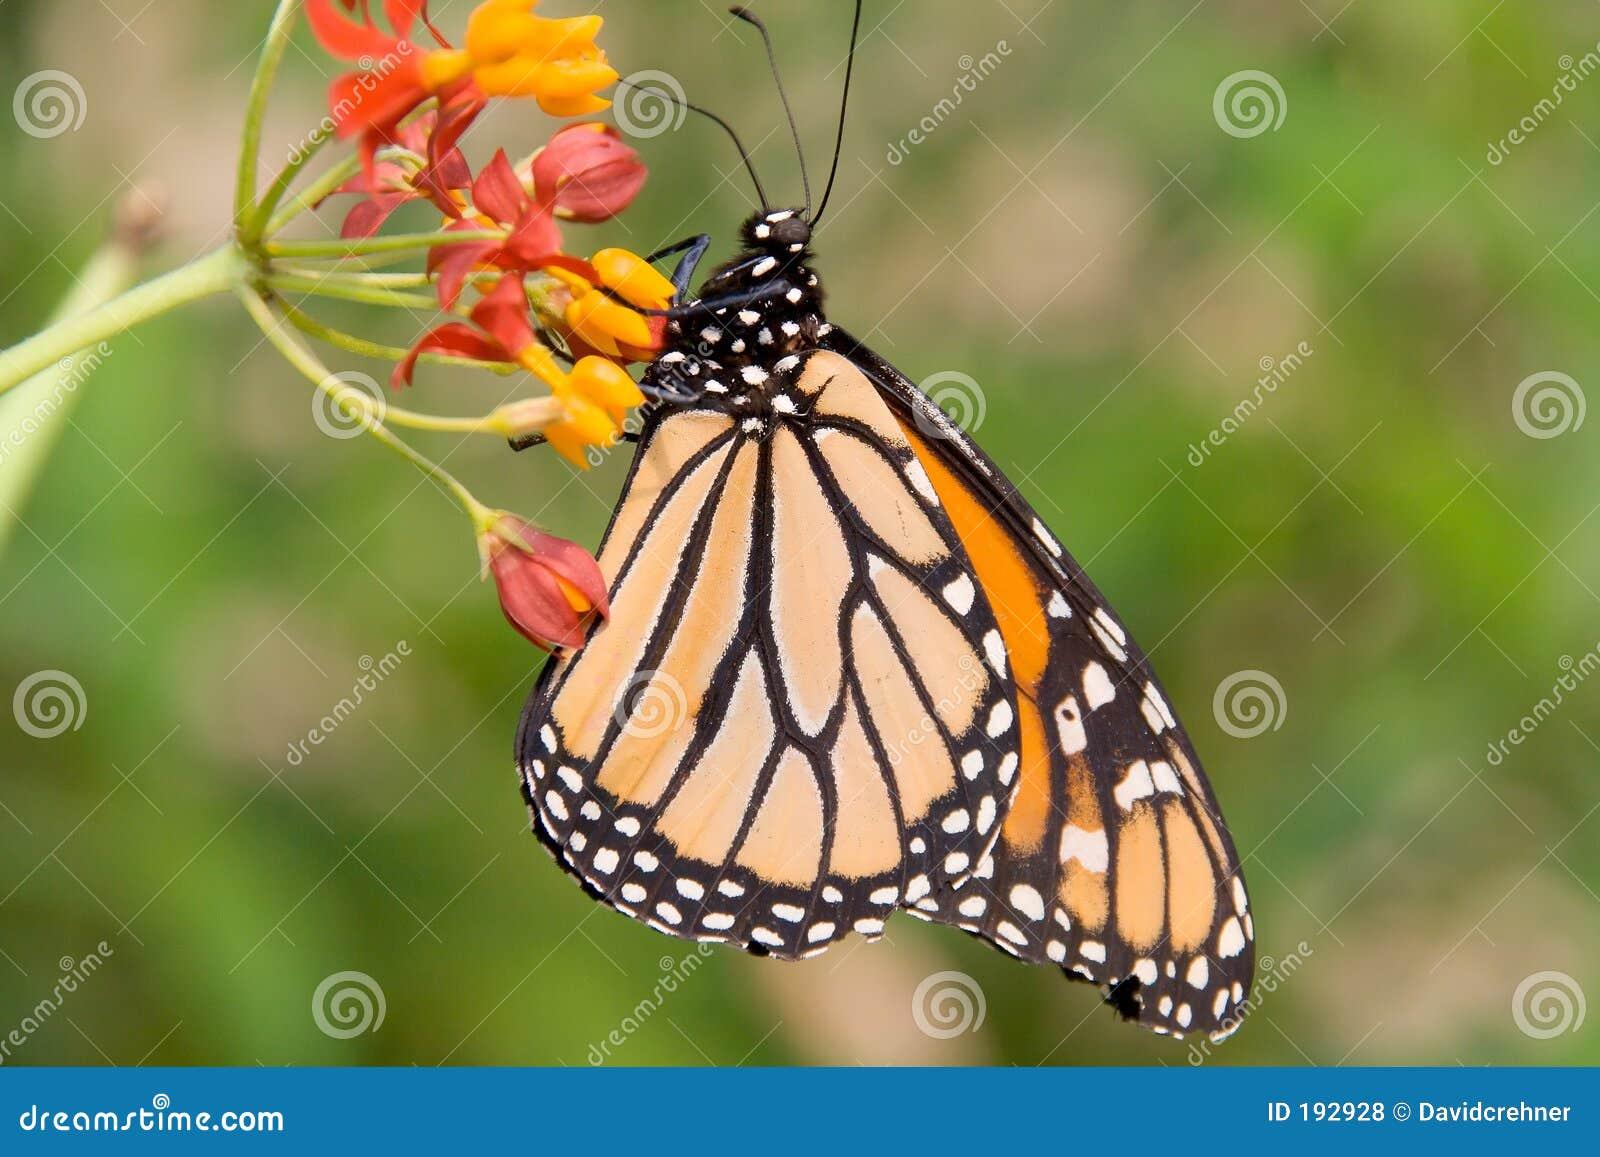 Mariposa de monarca en perfil